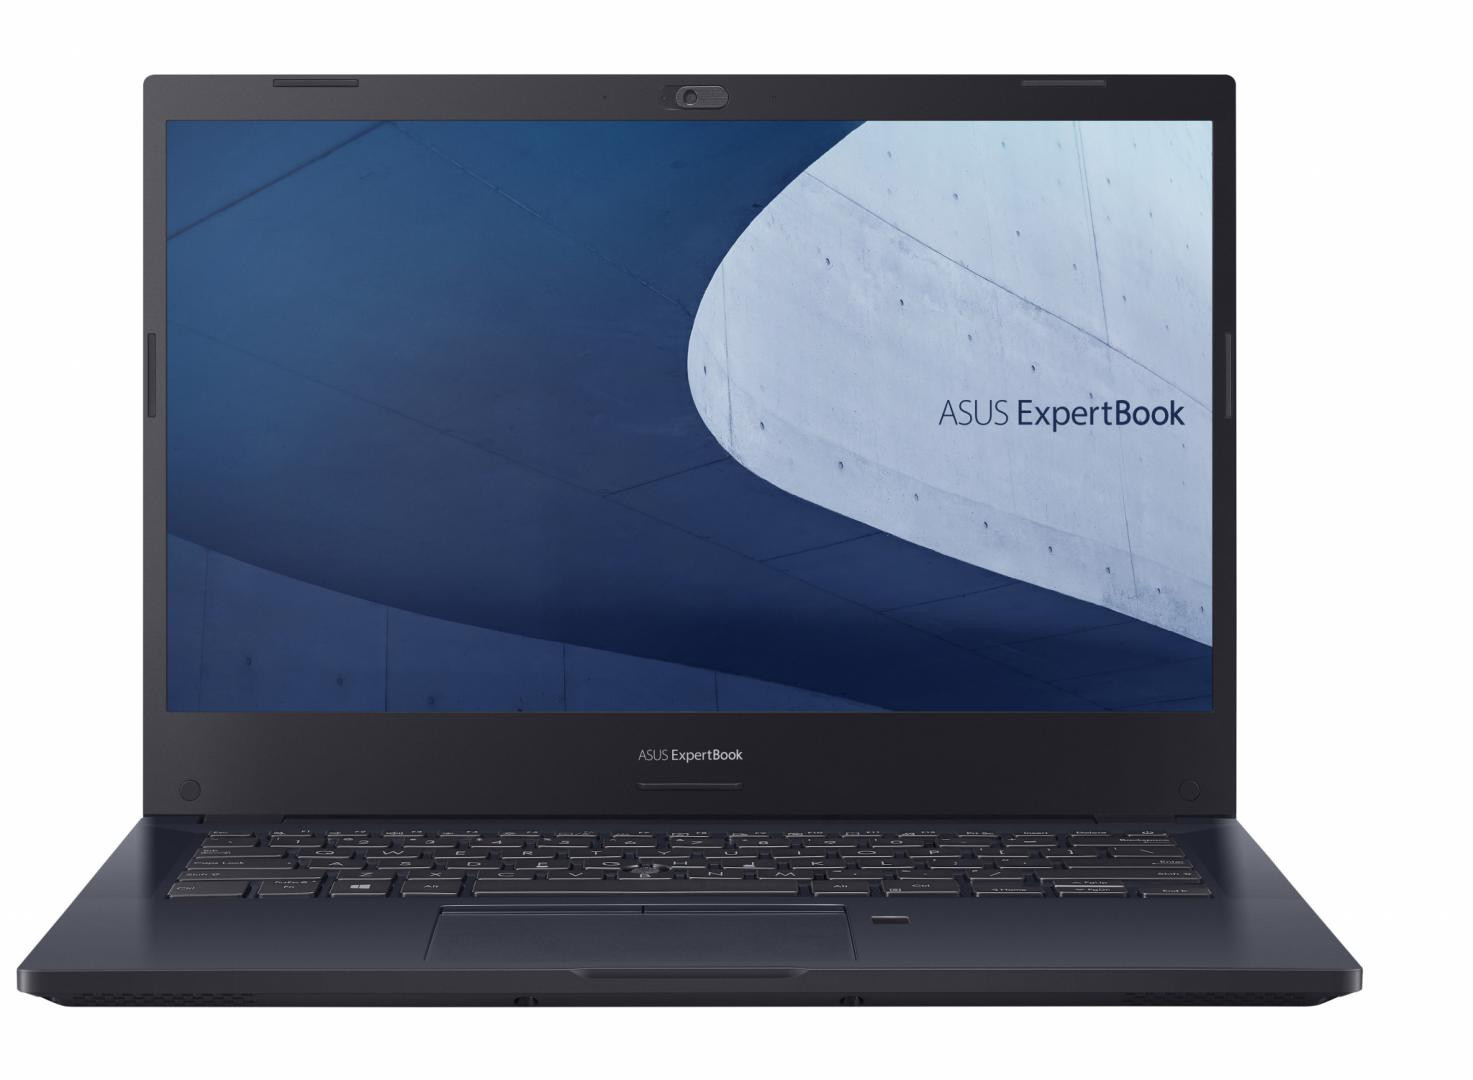 Laptop SMB ASUS ExpertBook P2 P2451FA-EK0174, 14 FHD (1920x1080), Anti- glare (mat), deschidere lid  - imaginea 1